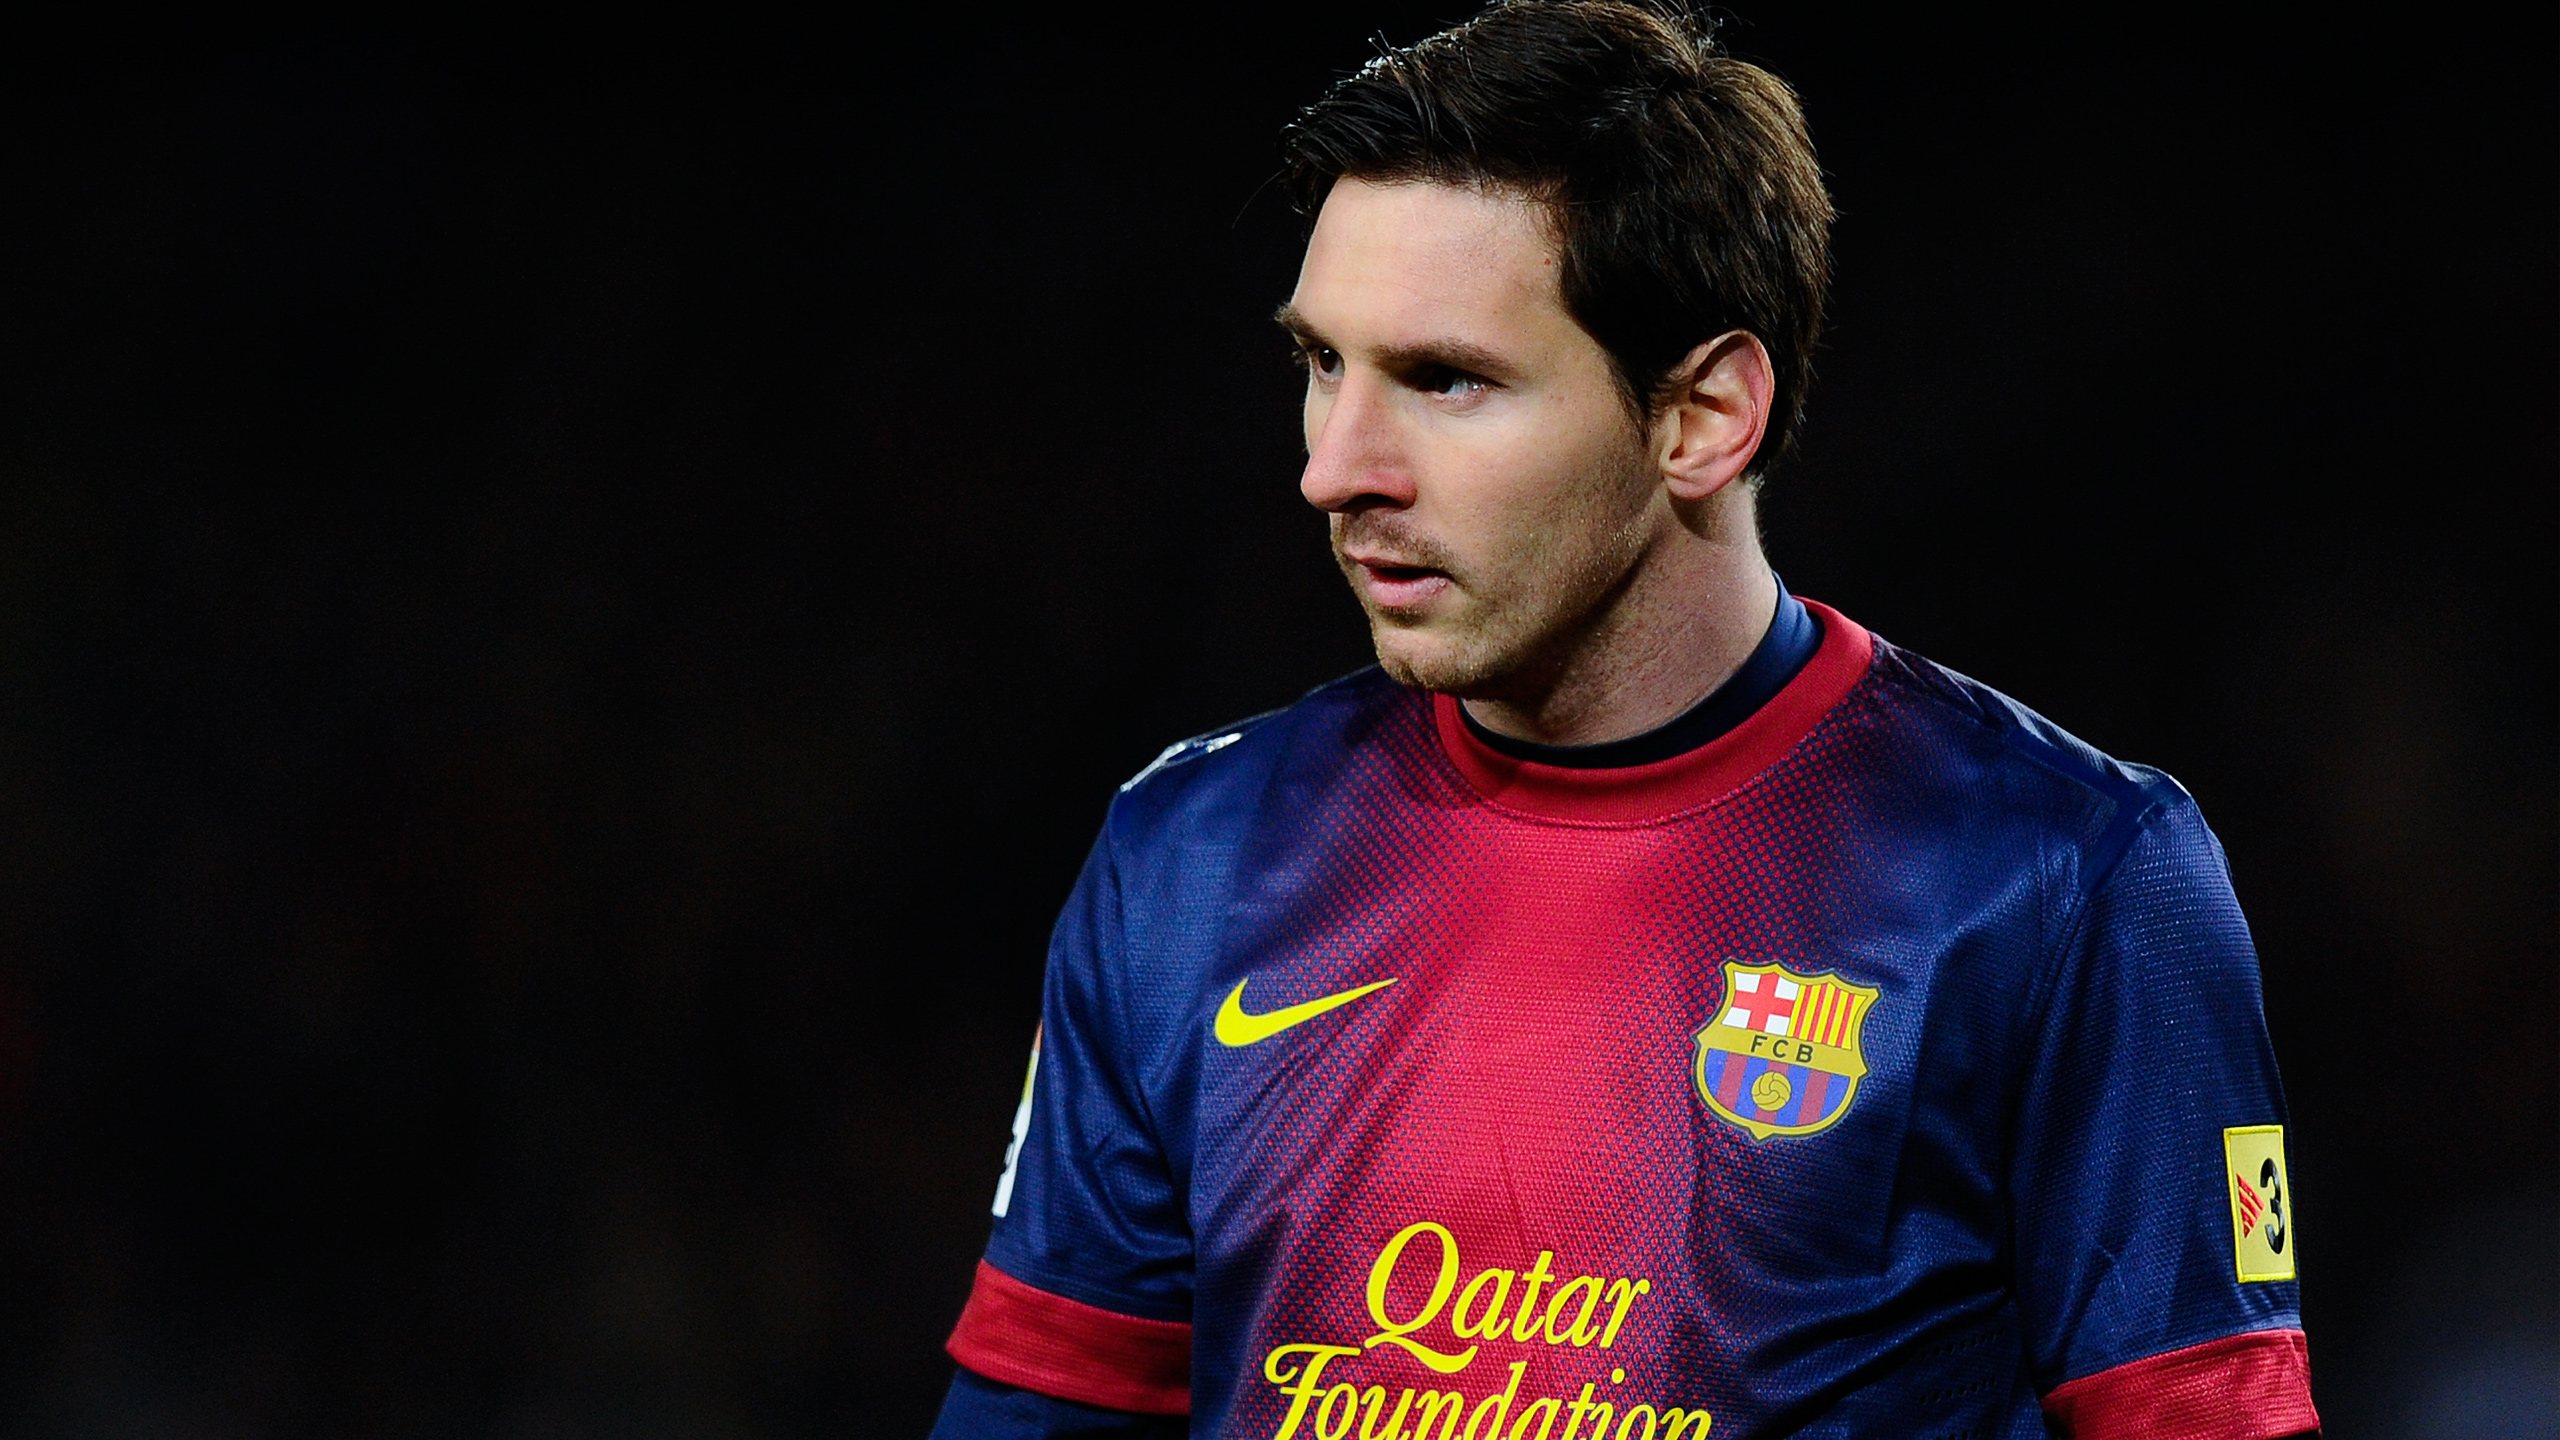 Wallpaper 4k Lionel Messi Fc Barcelona Barcelona Lionel Messi Wayne